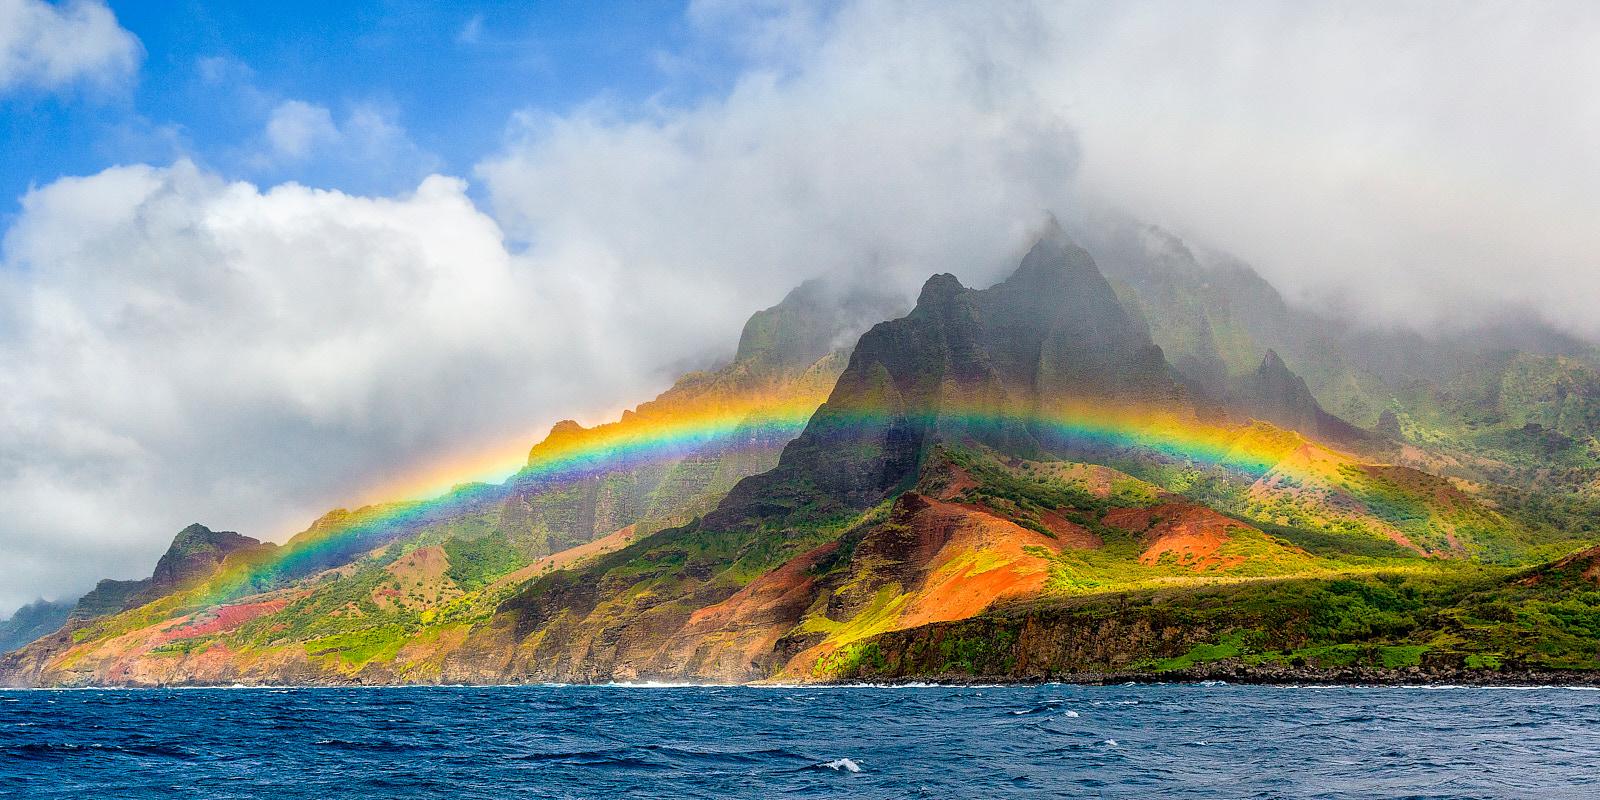 A panoramic view of a vibrant rainbow along the na pali coast on the Hawaiian island of Kauai